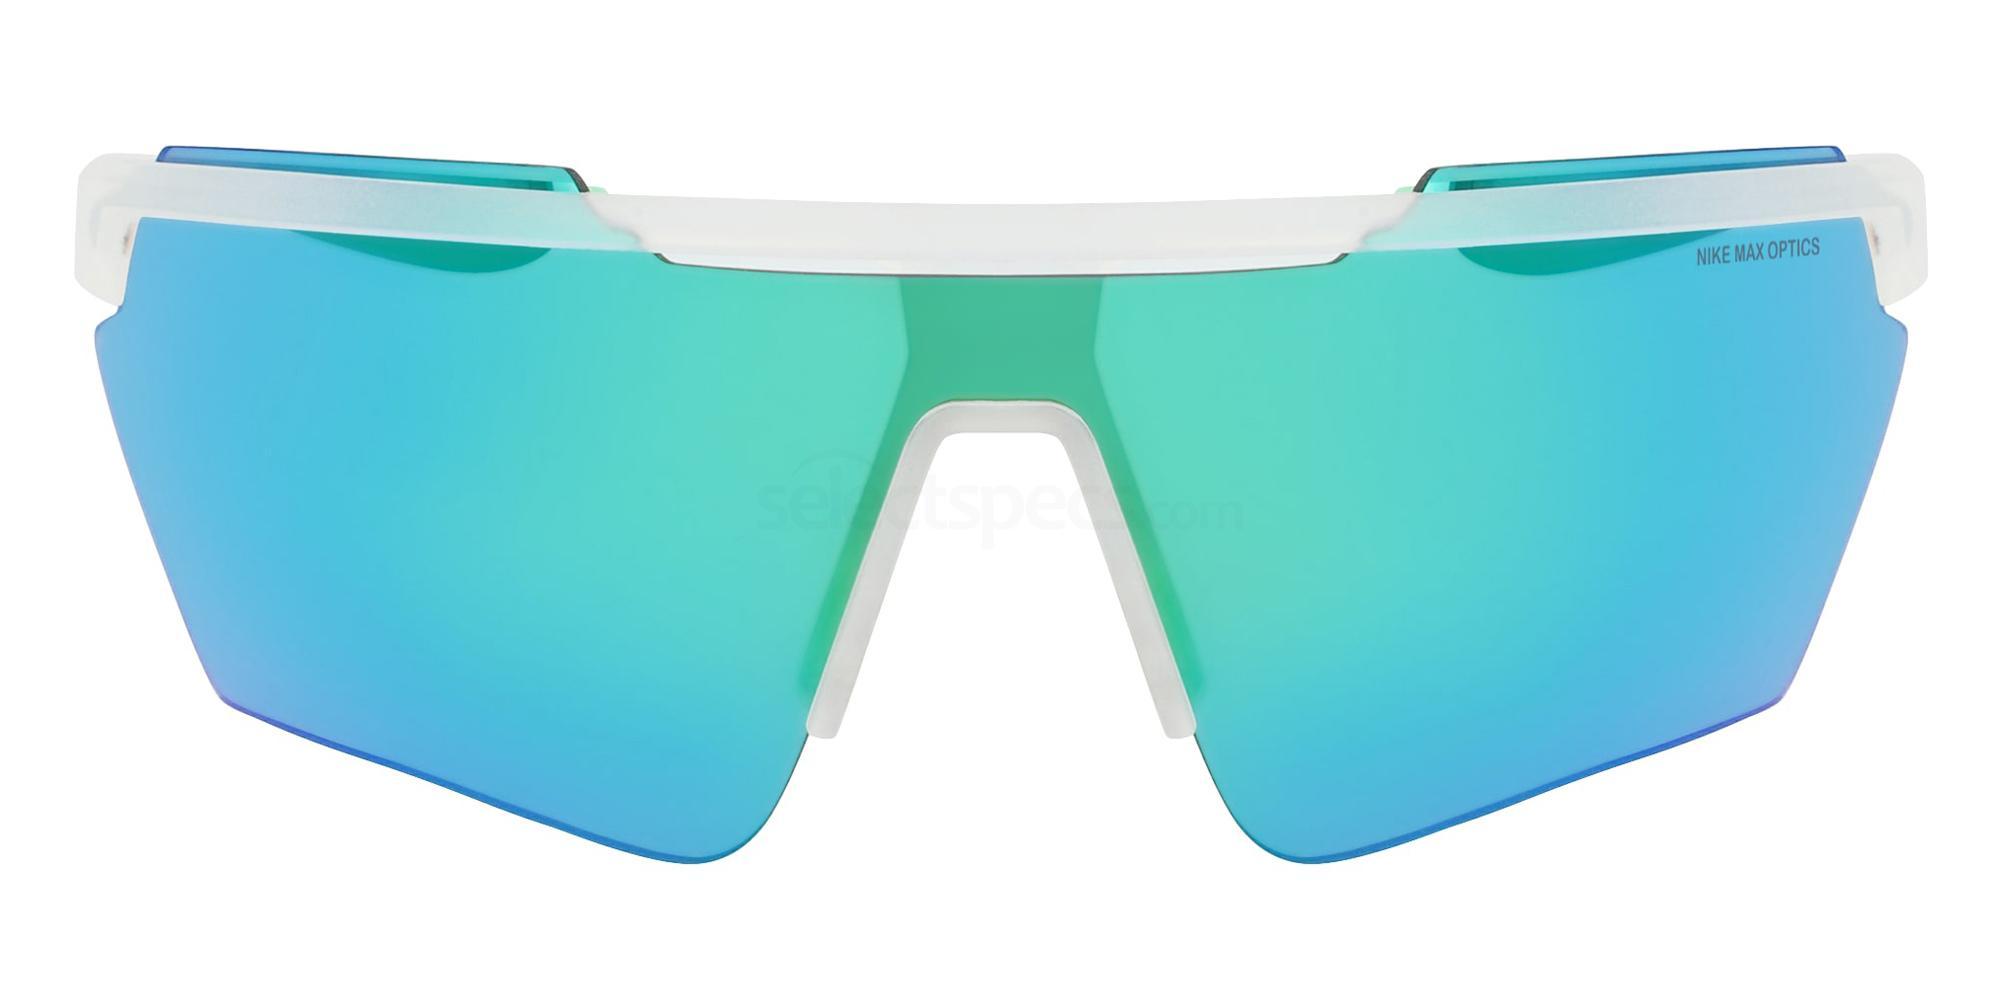 900 NIKE WNDSHLD ELITE PRO M DC3382 Sunglasses, Nike